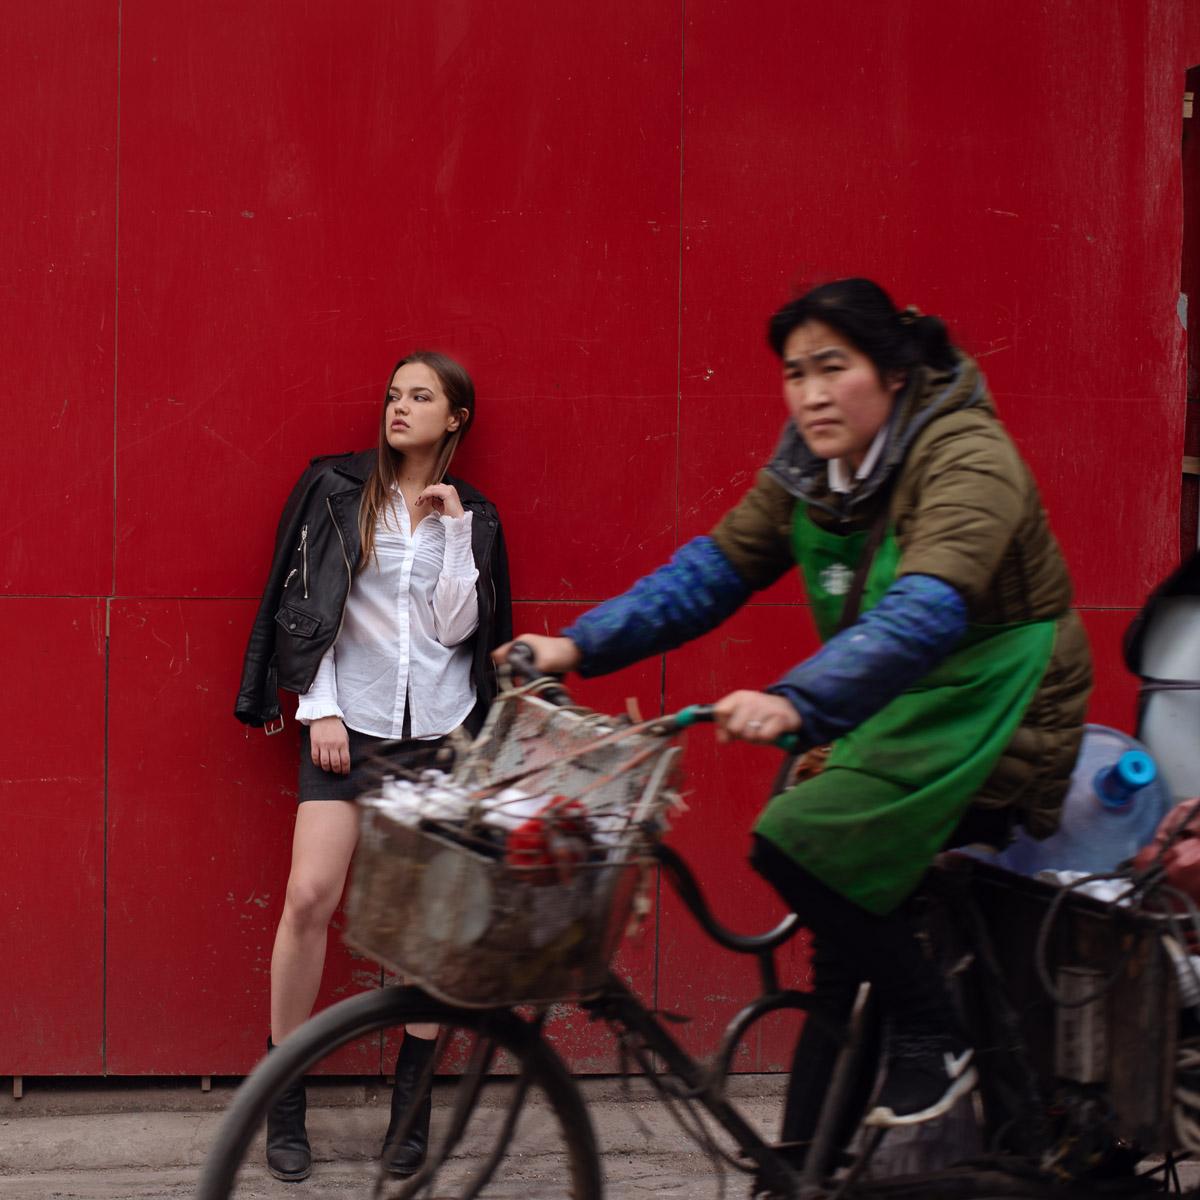 Shanghai Portrait Photographer Travel